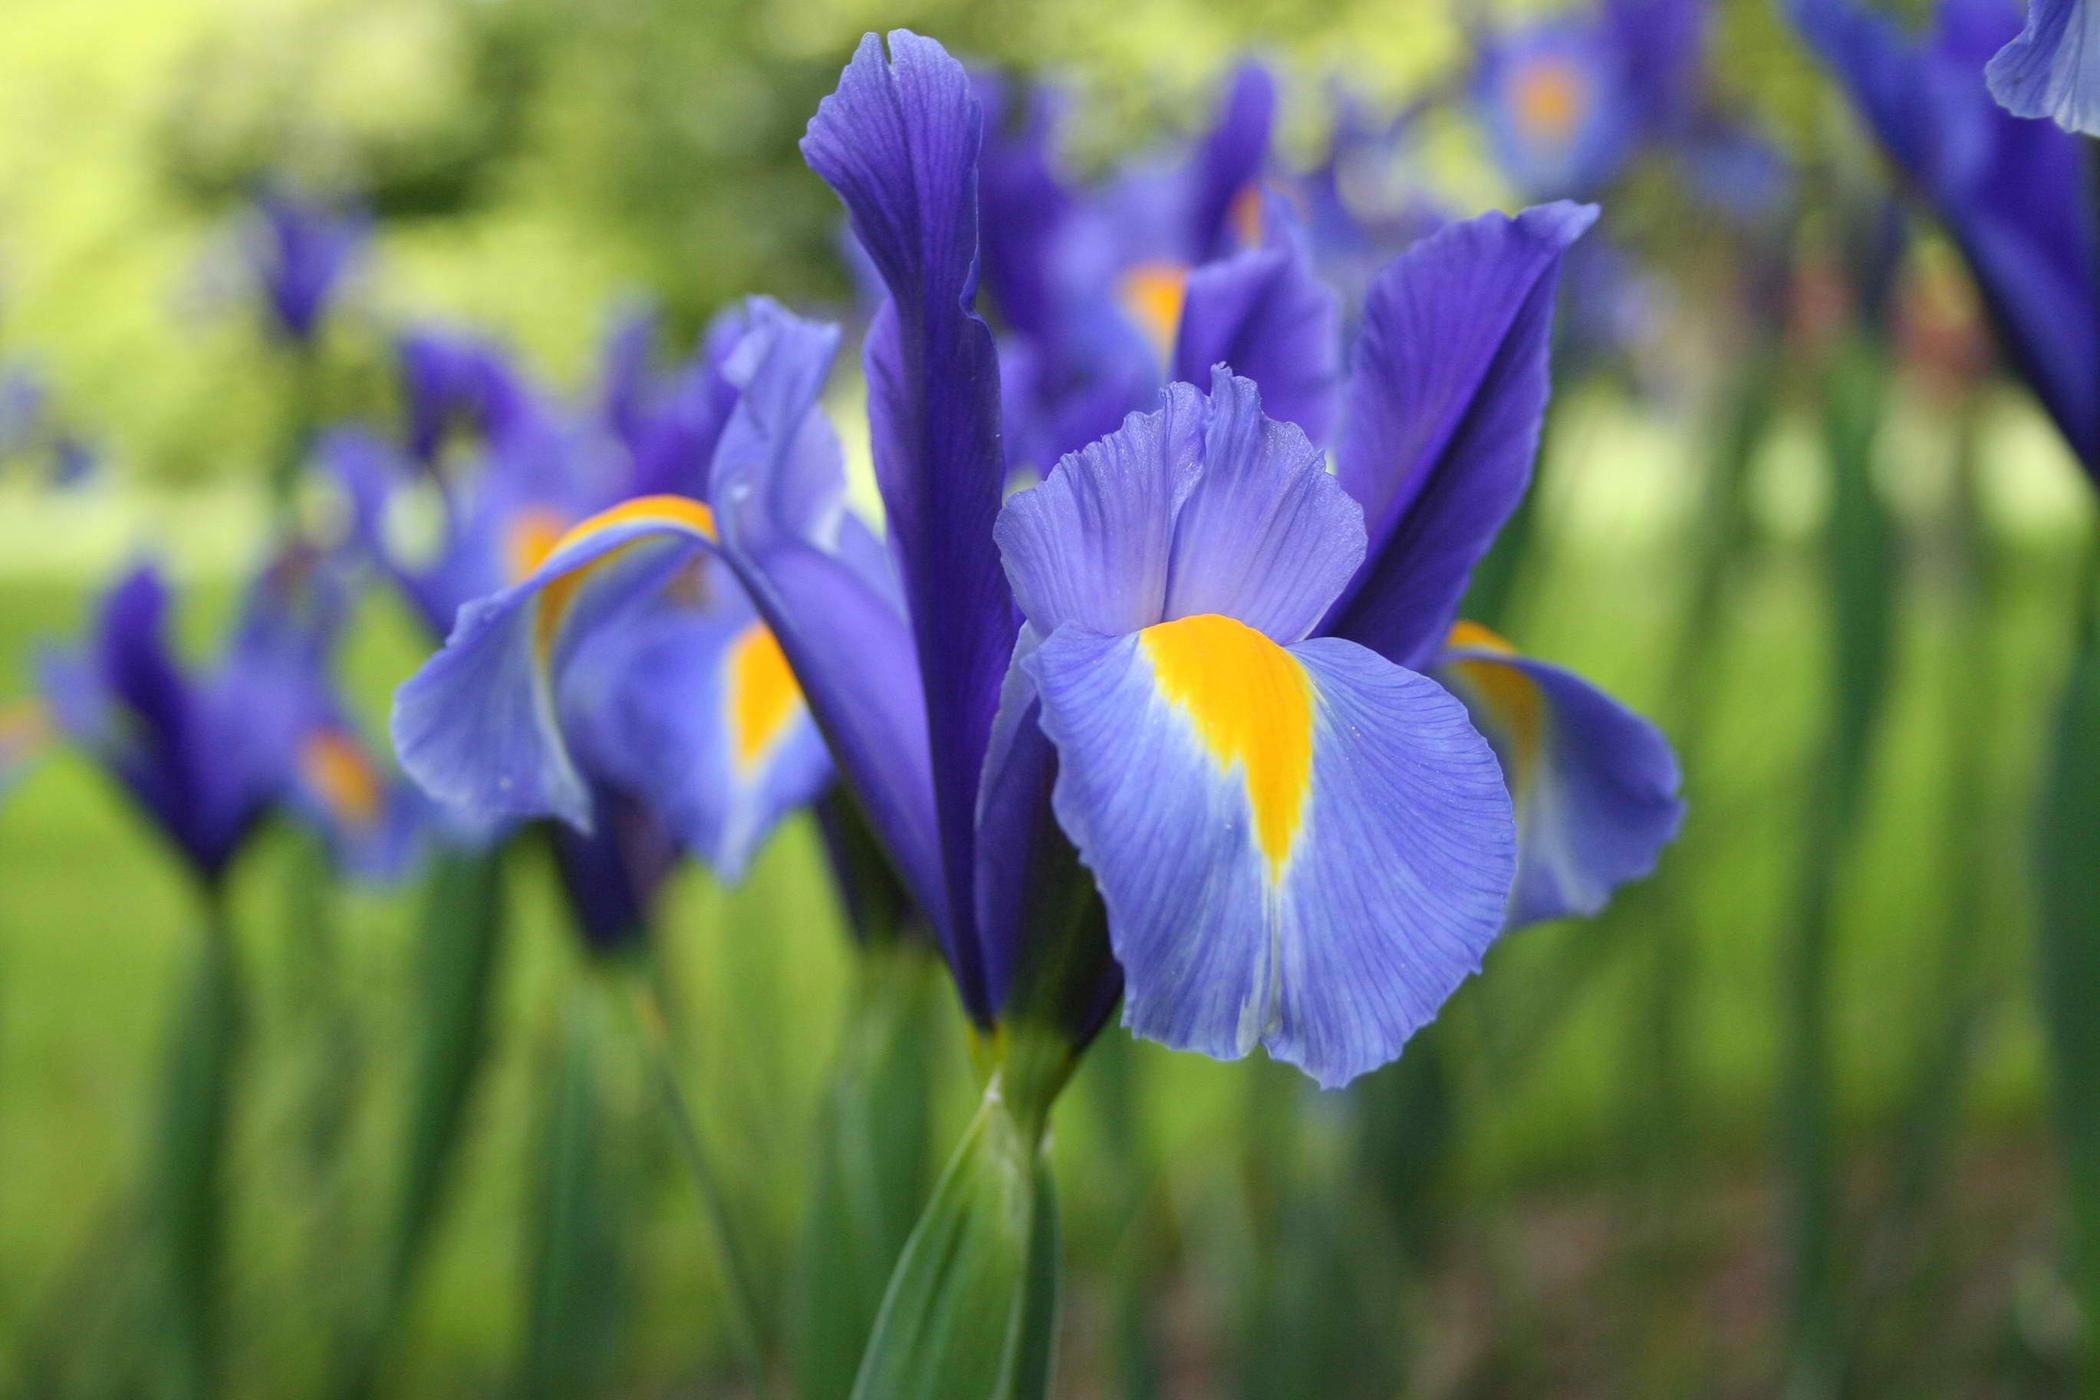 Iris Poisoning in Cats